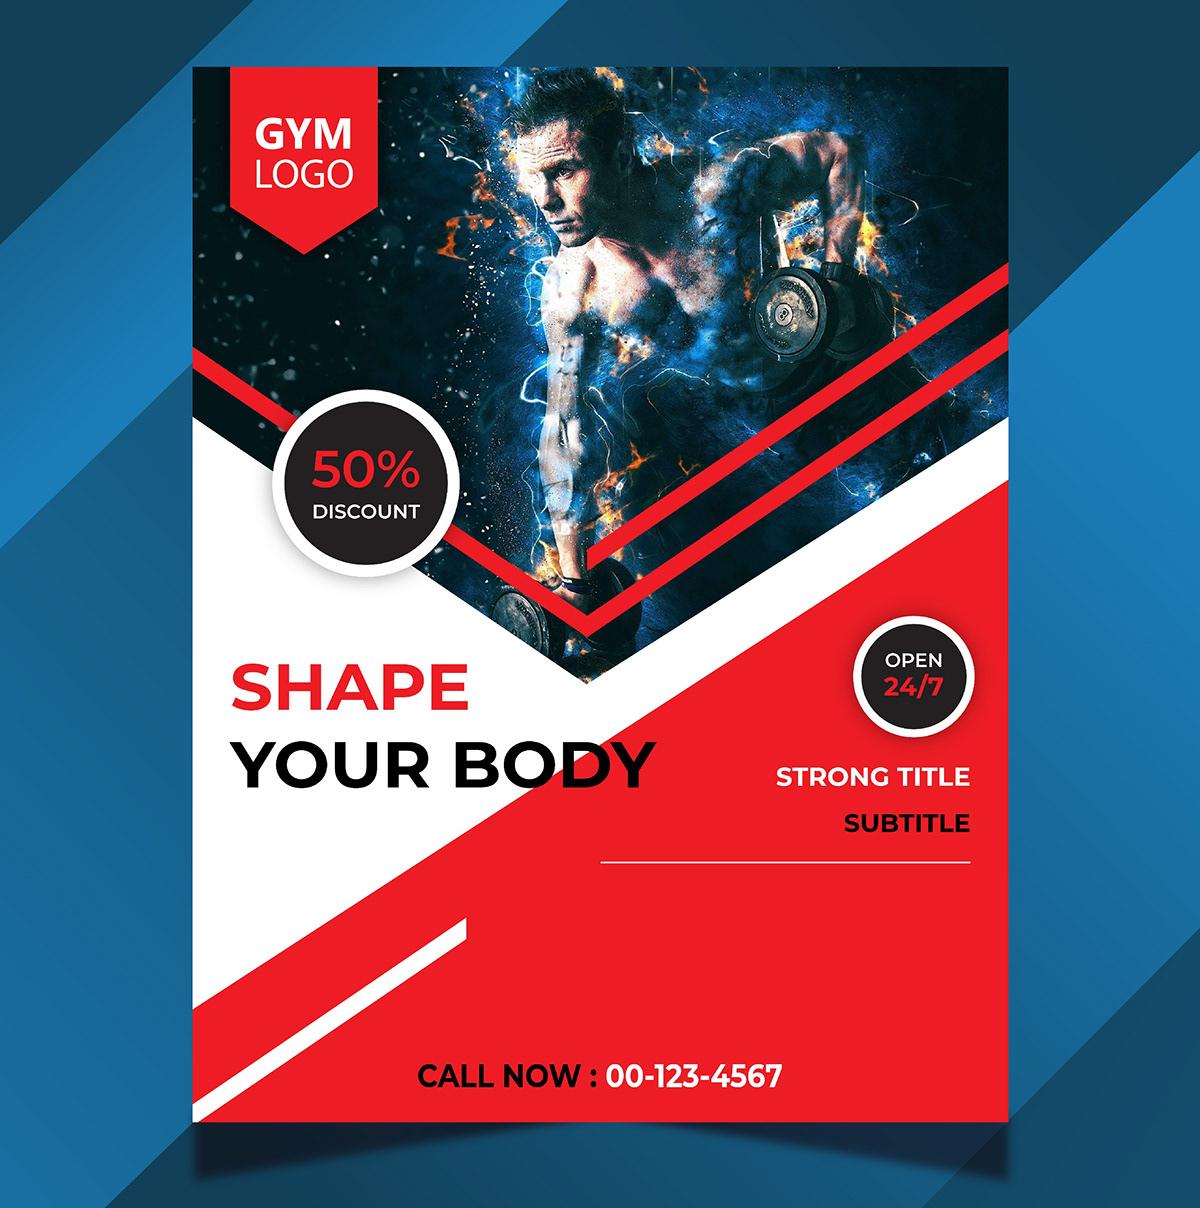 gym flyer gym flyer design gym flyer psd gym flyer template Gym flyer vector